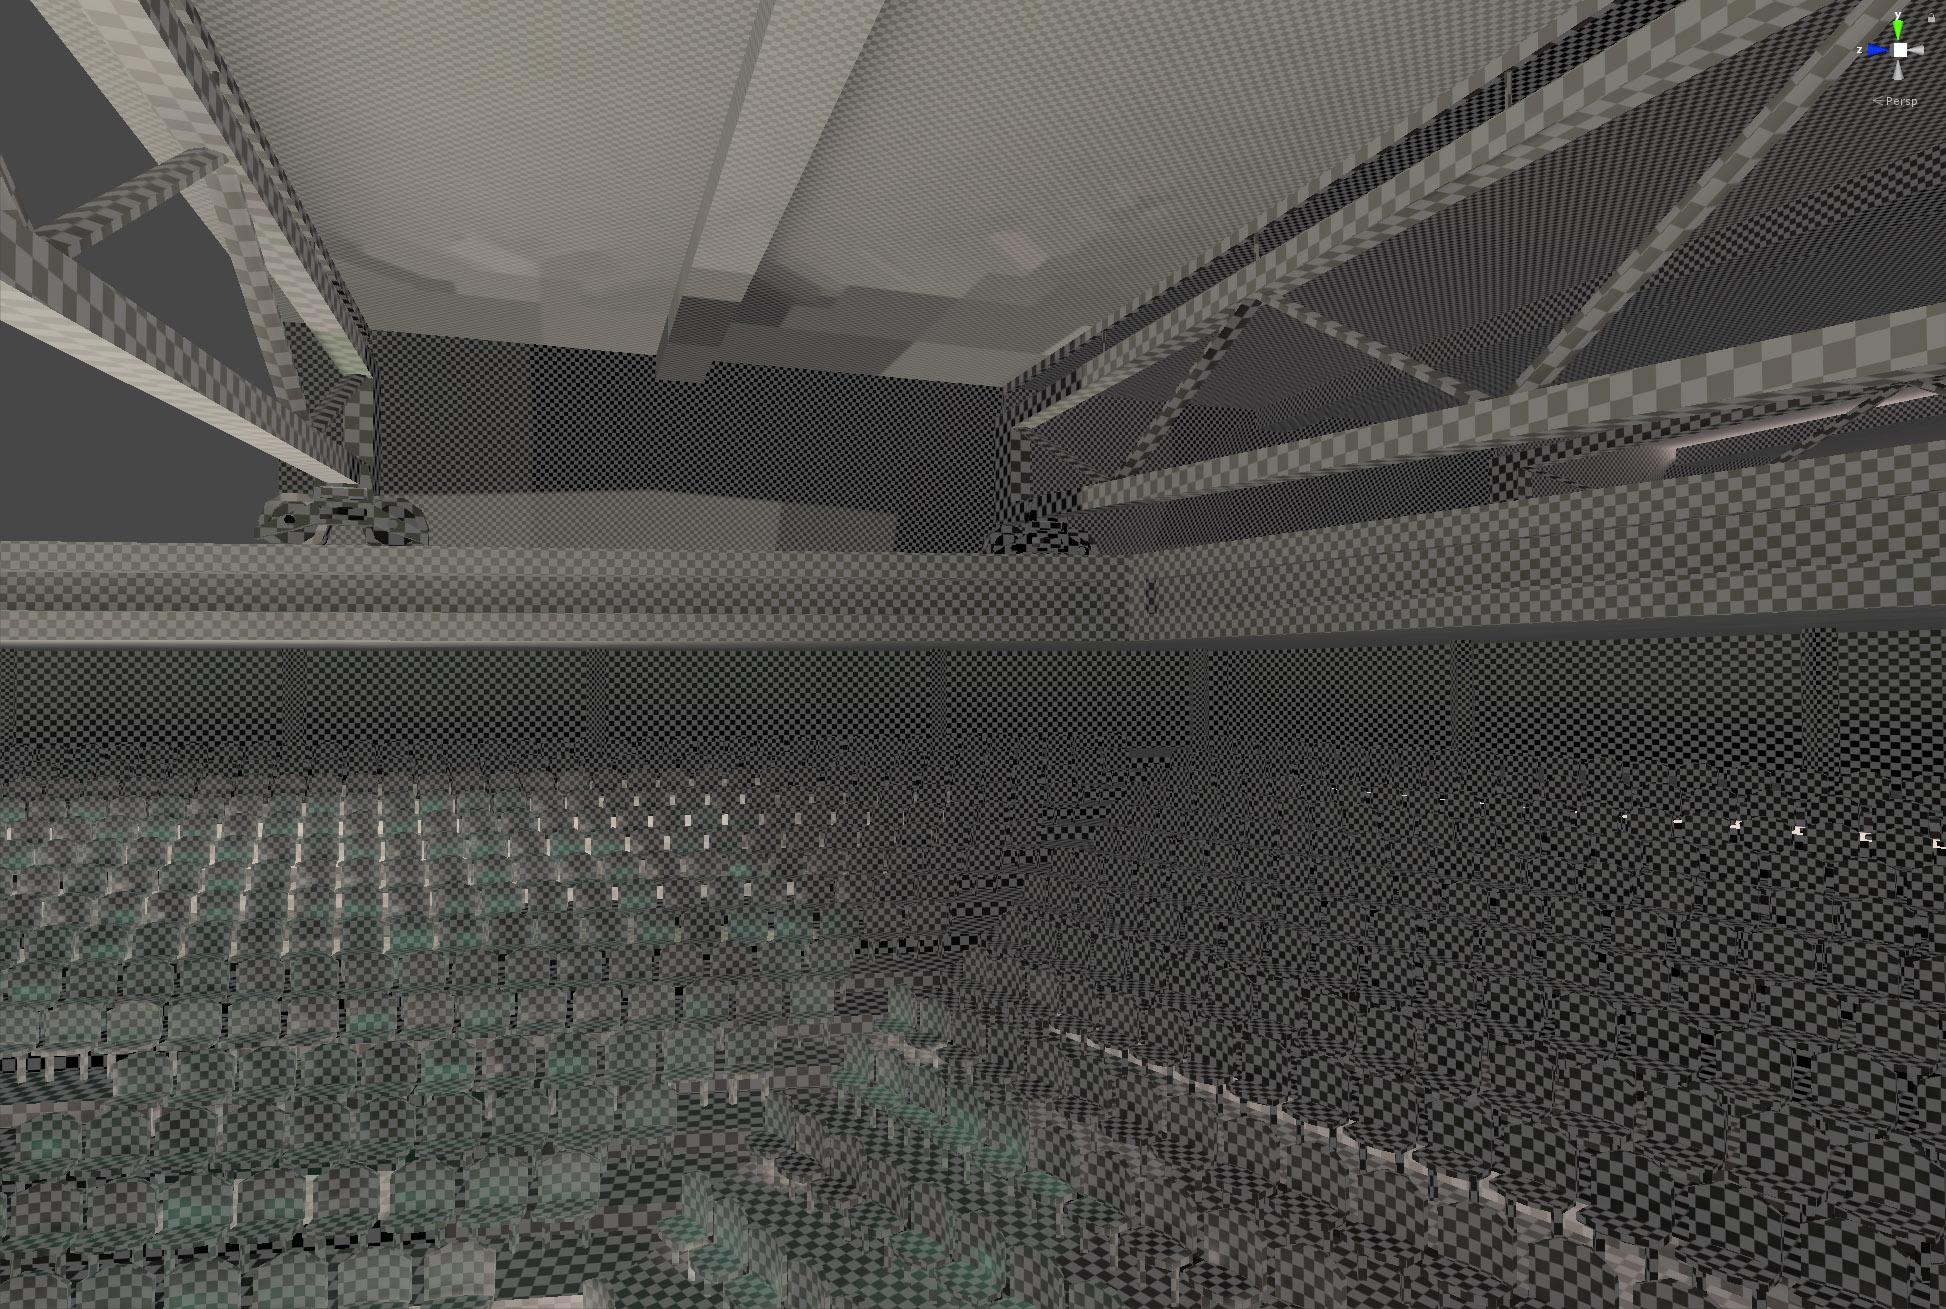 2019-08 - TE4 Stadium - Progressive GPU - Baked Lightmap#3.jpg